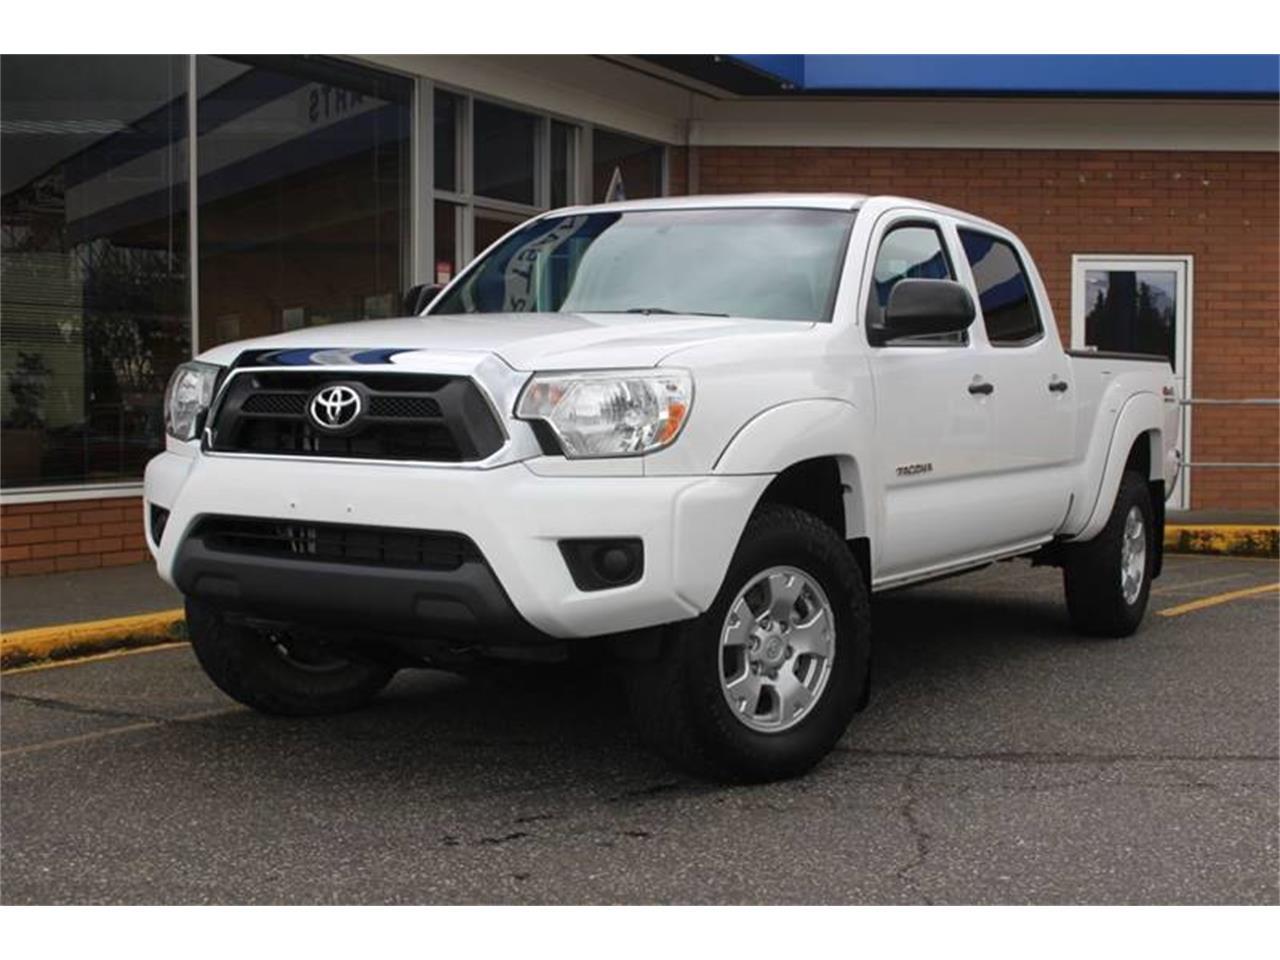 2013 Toyota Tacoma For Sale >> For Sale 2013 Toyota Tacoma In Lynden Washington